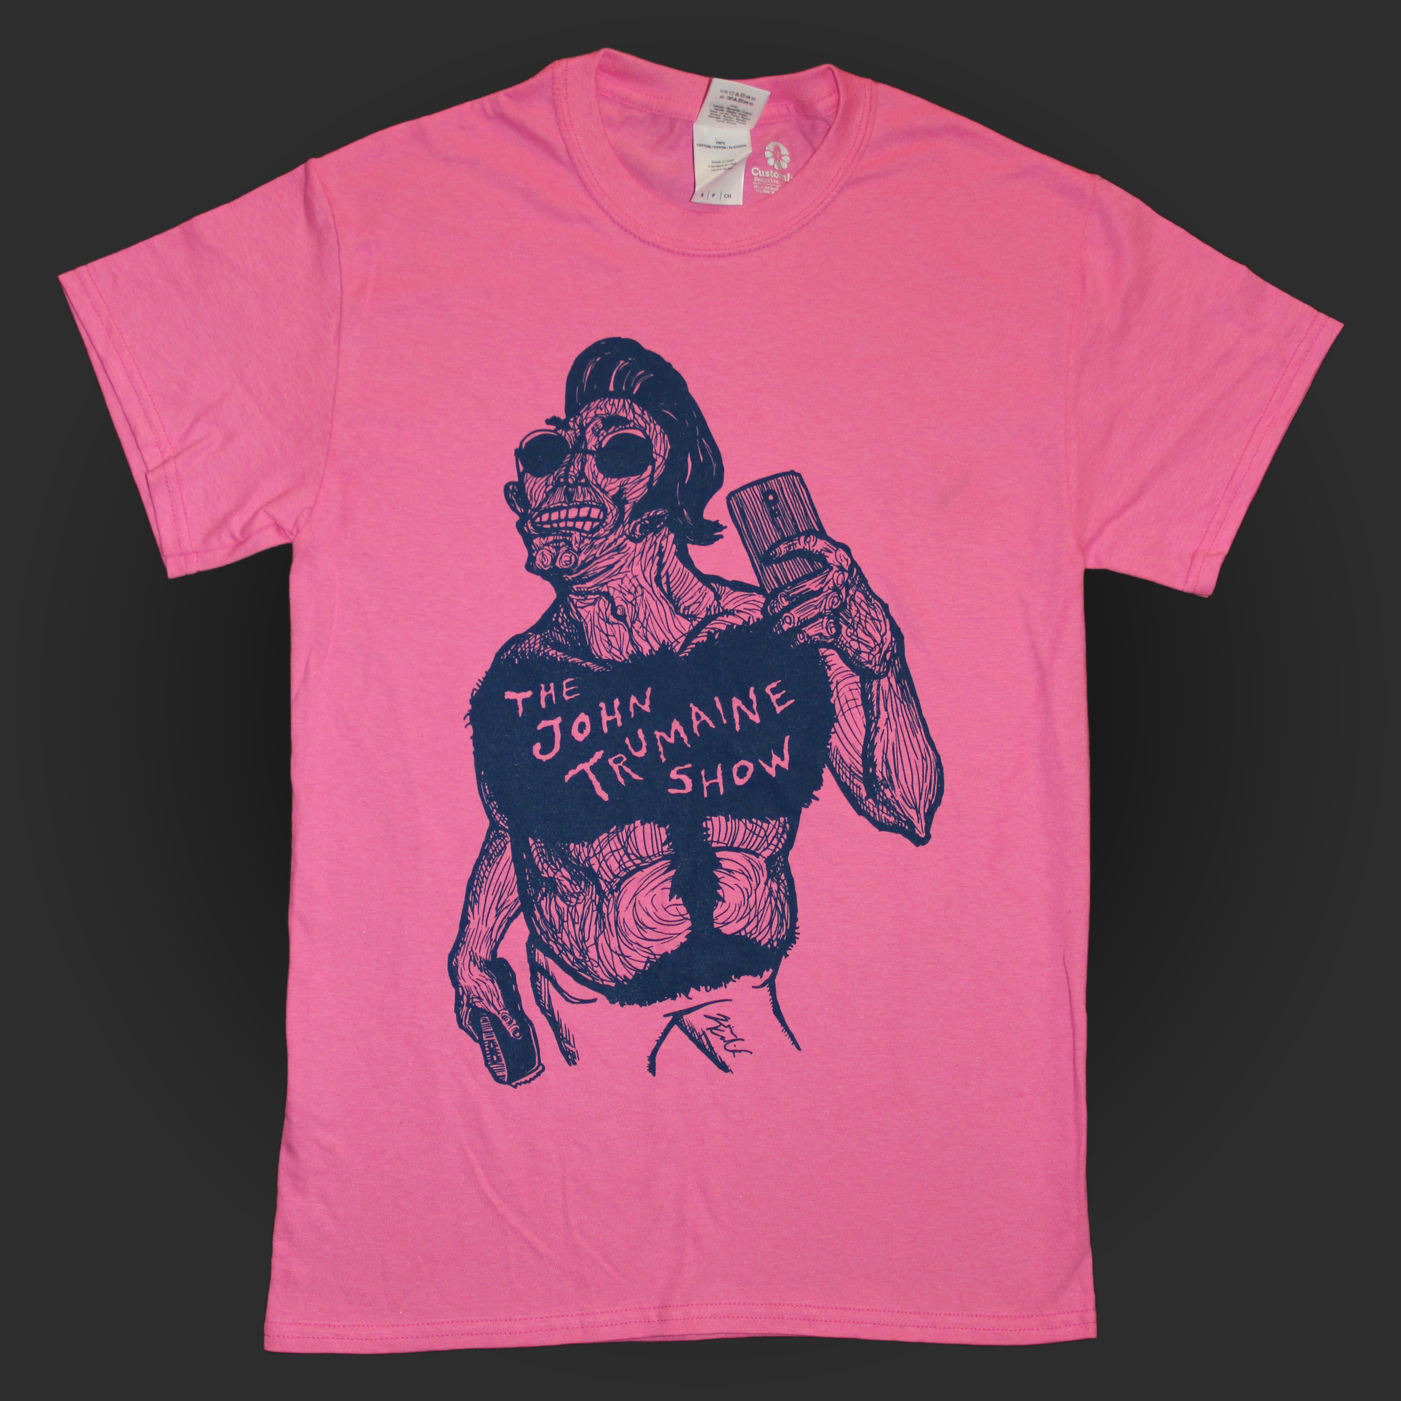 $10 Pink Shirt